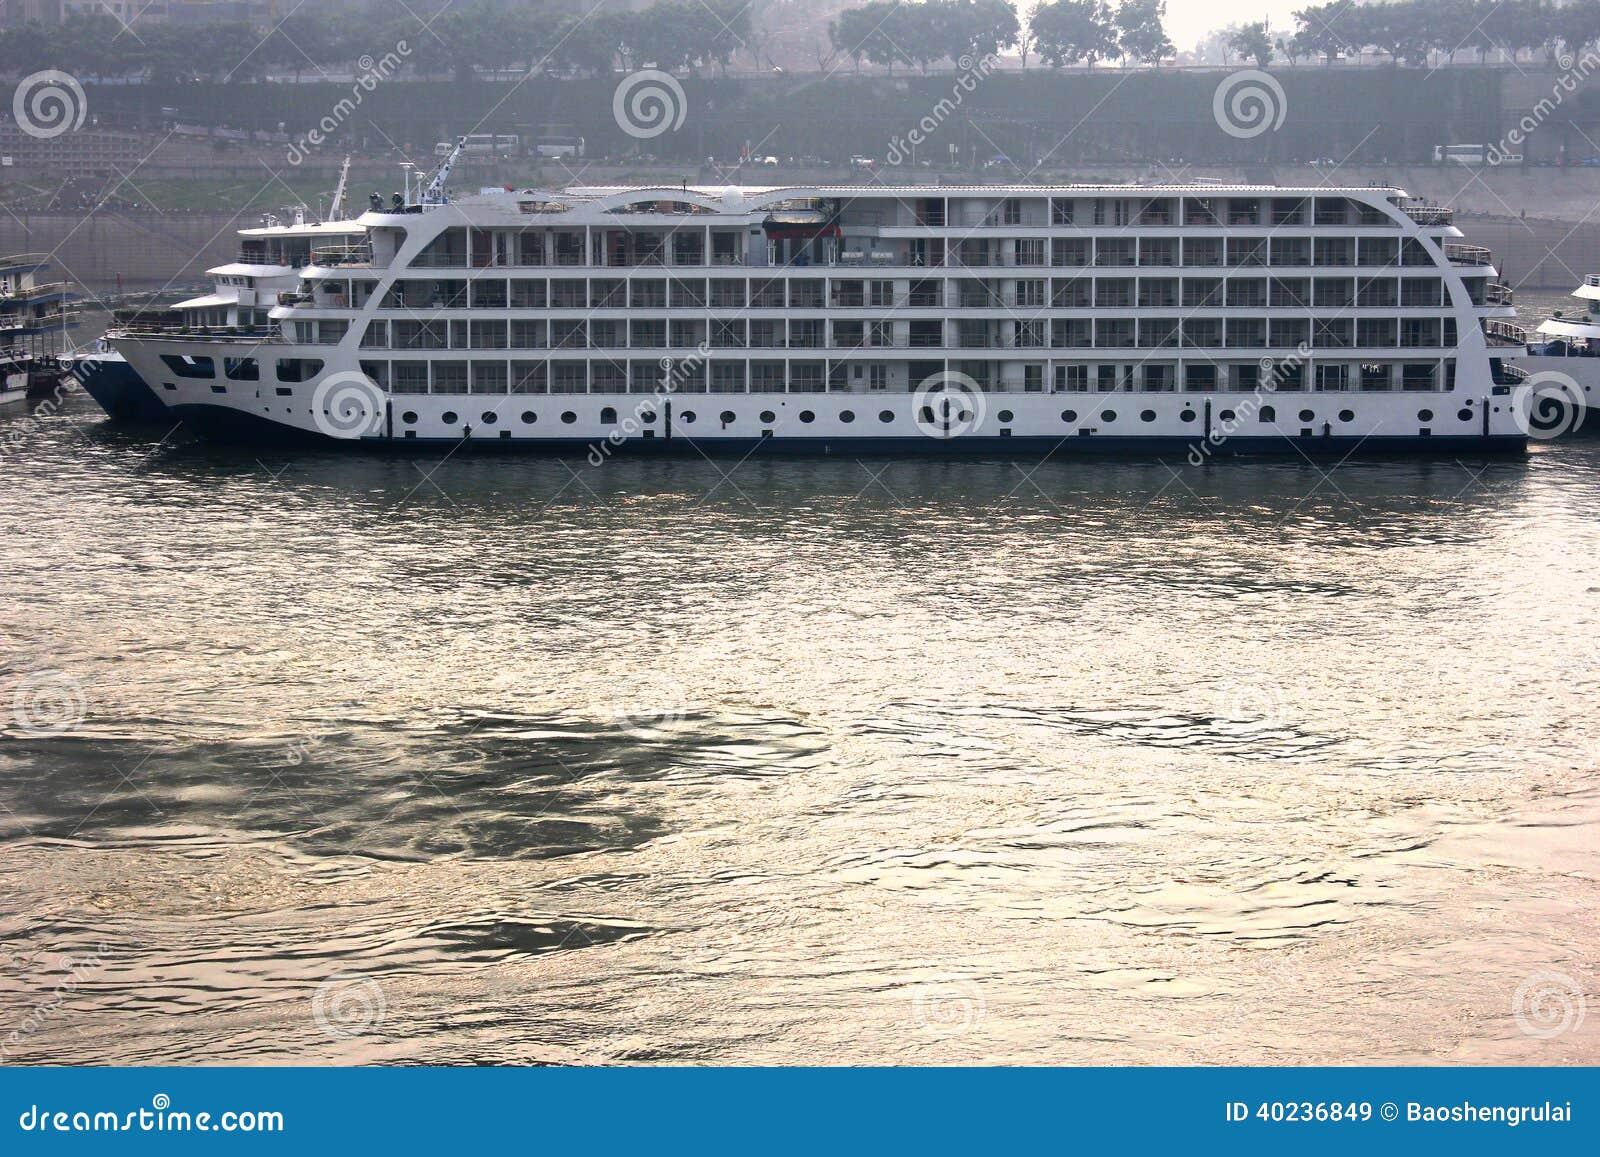 Yangtze River China River Boat Cruise Ship, Travel